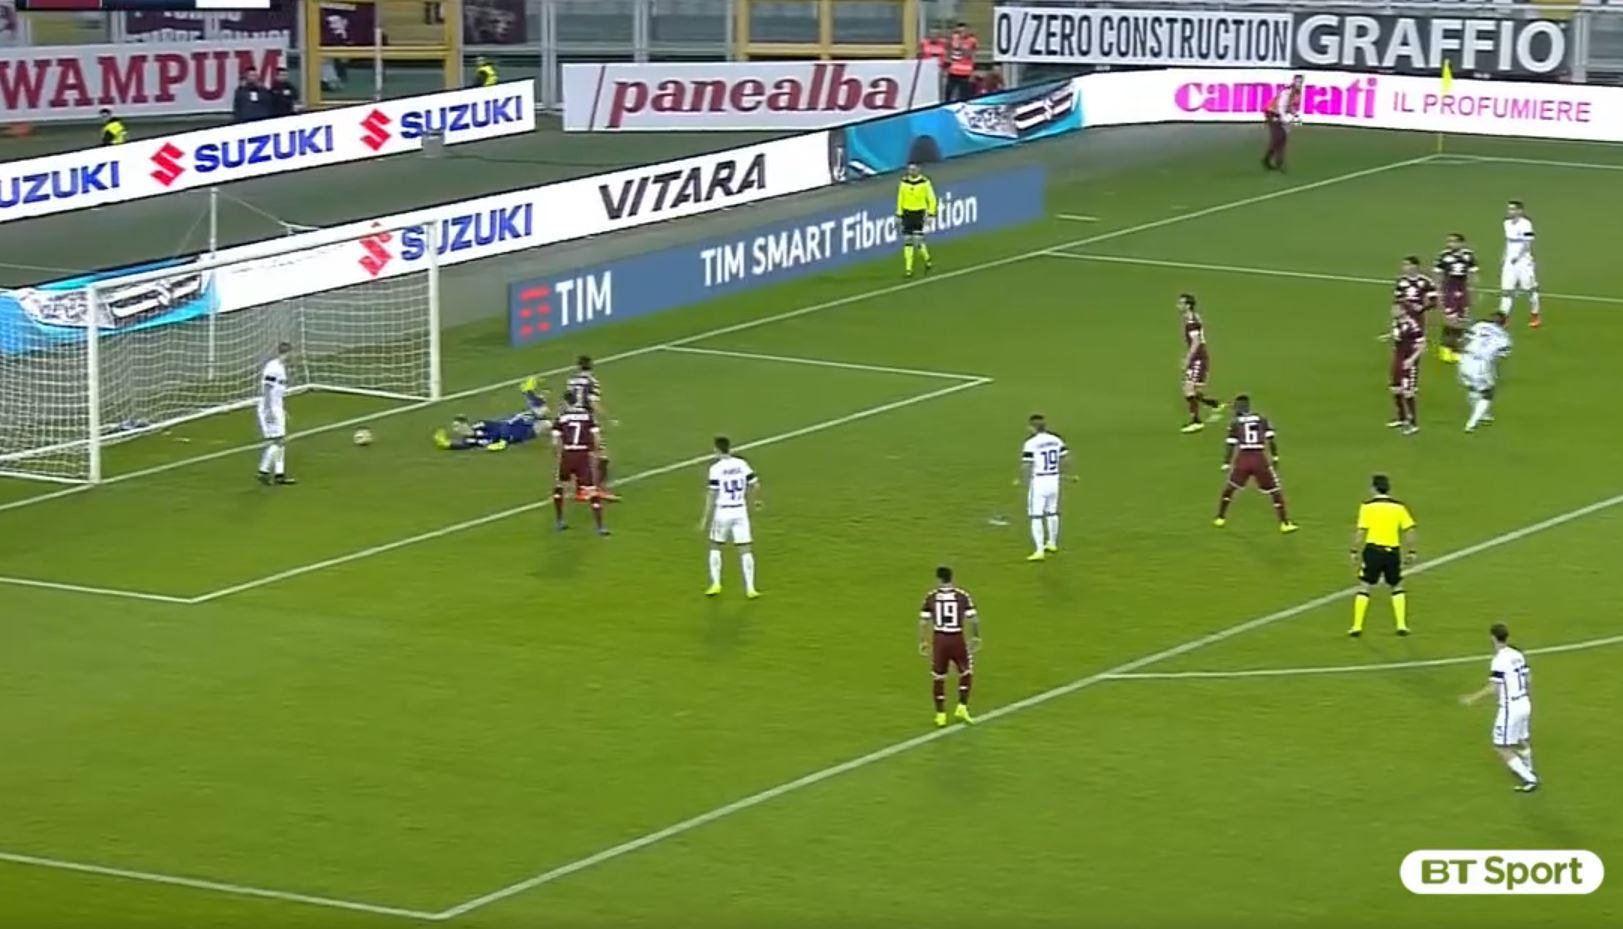 Joe Hart at fault for both goals in shocking Torino performance